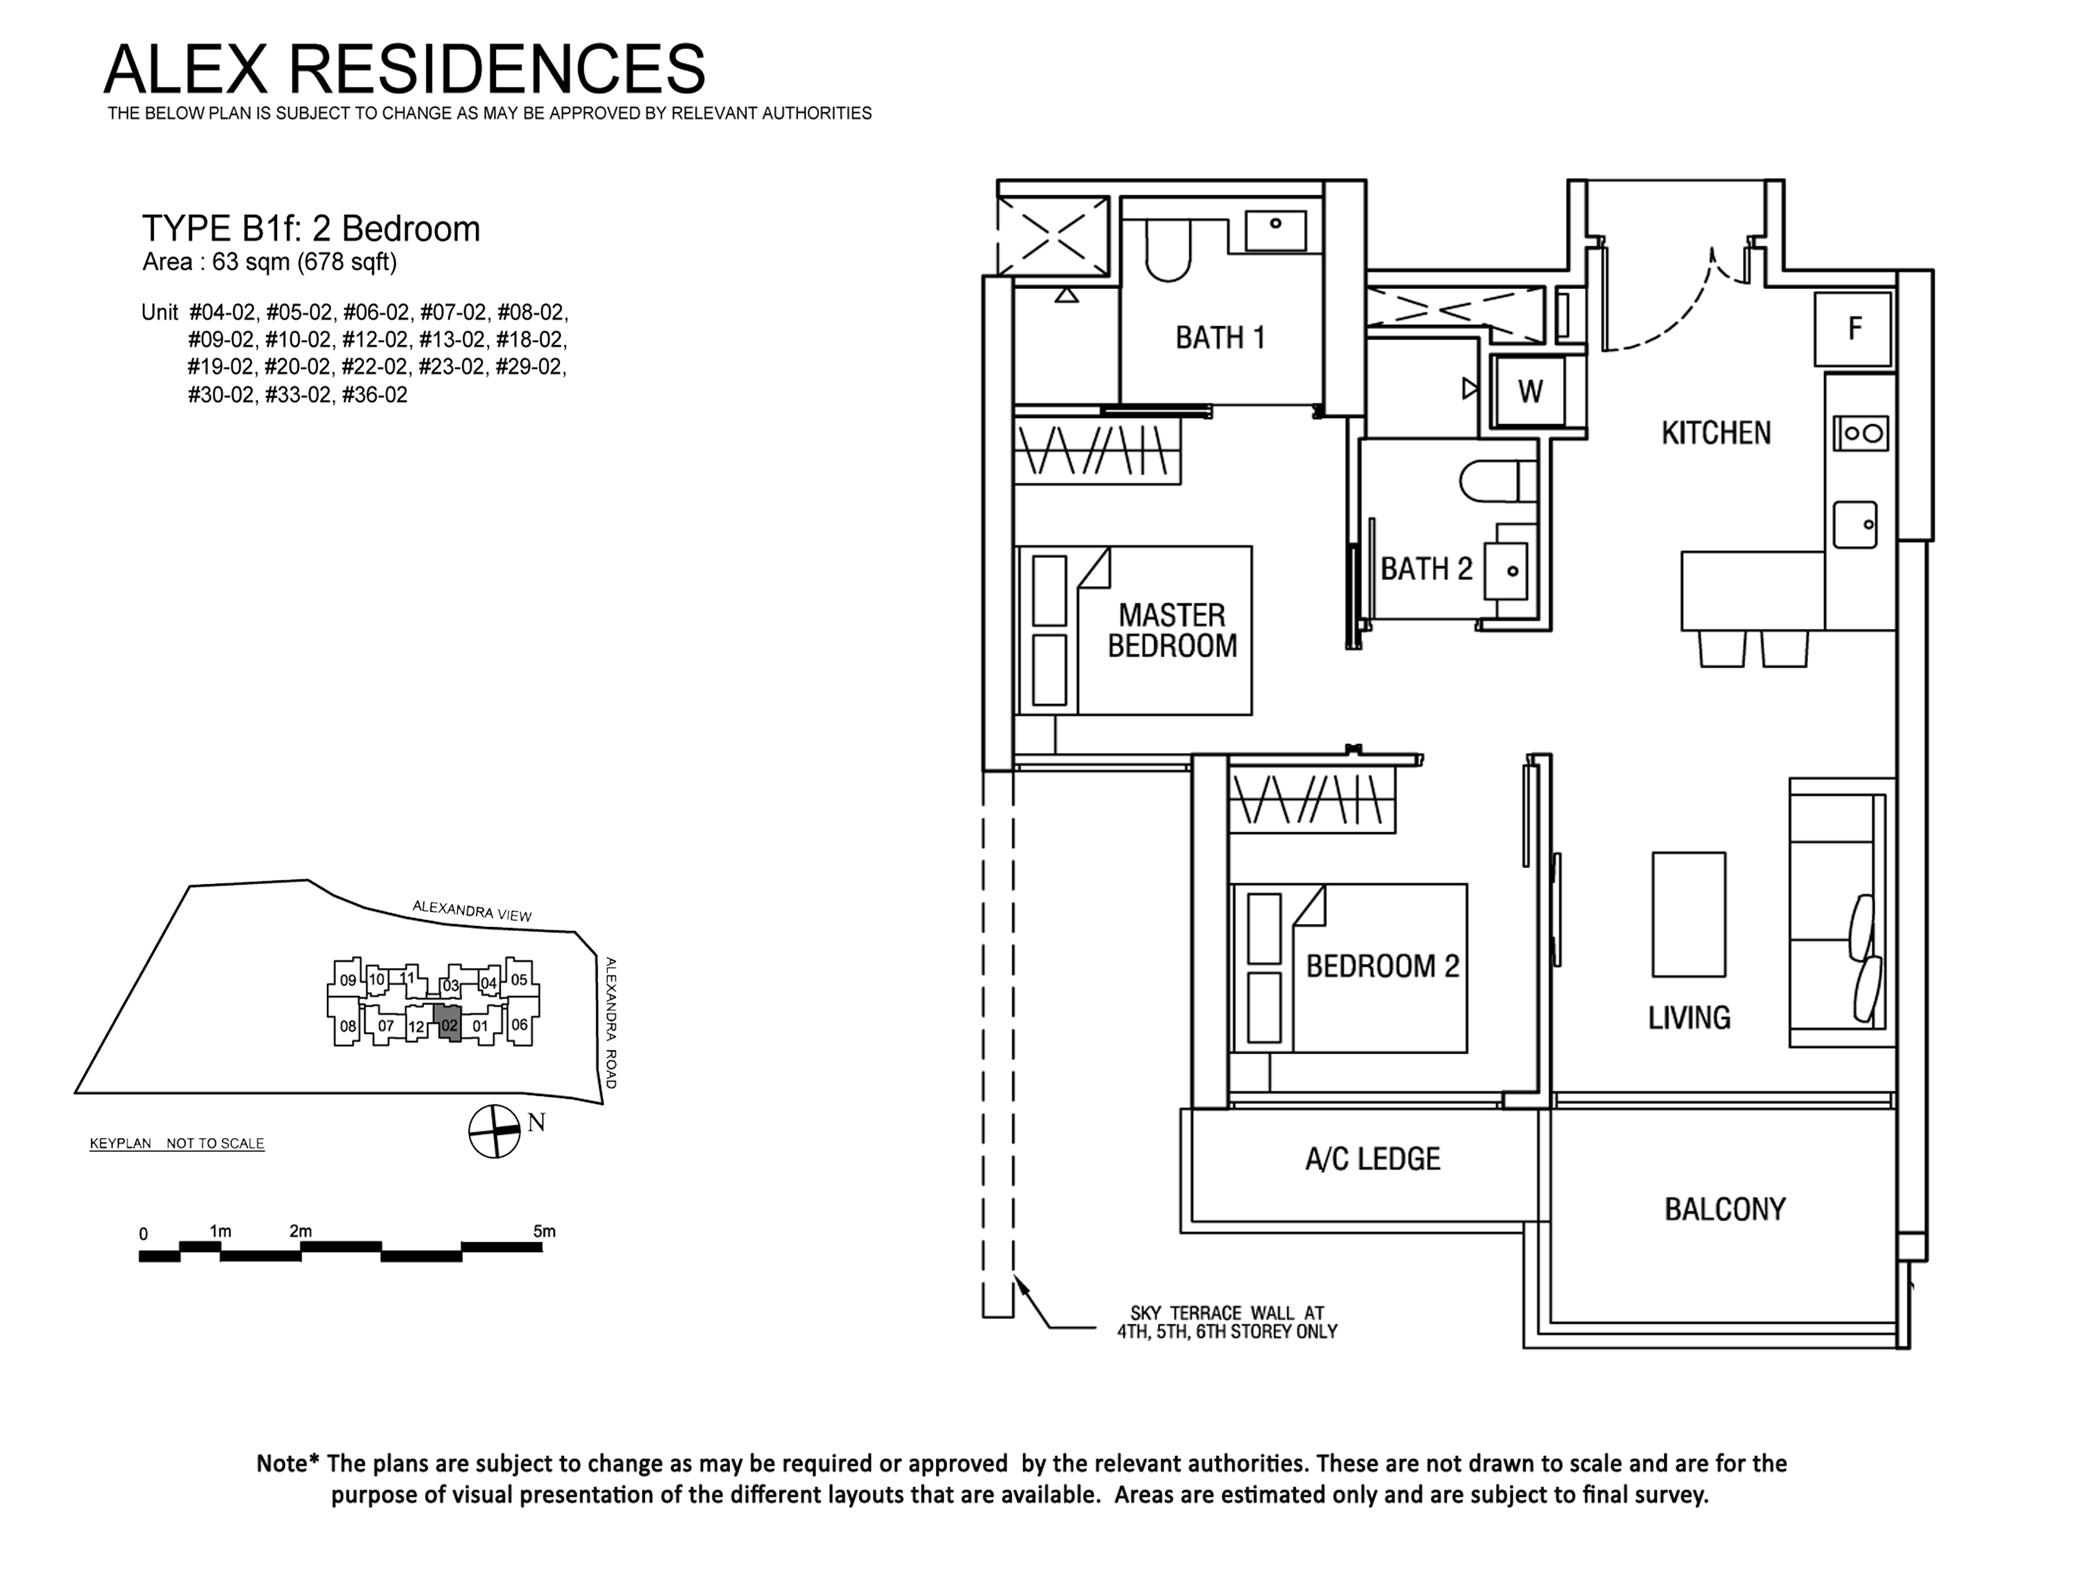 Alex-Residences floor planAlex-Residences floor plan alex residences Alex Residences | Showflat Hotline +65 6100 7122 2 BEDROOM stack 02